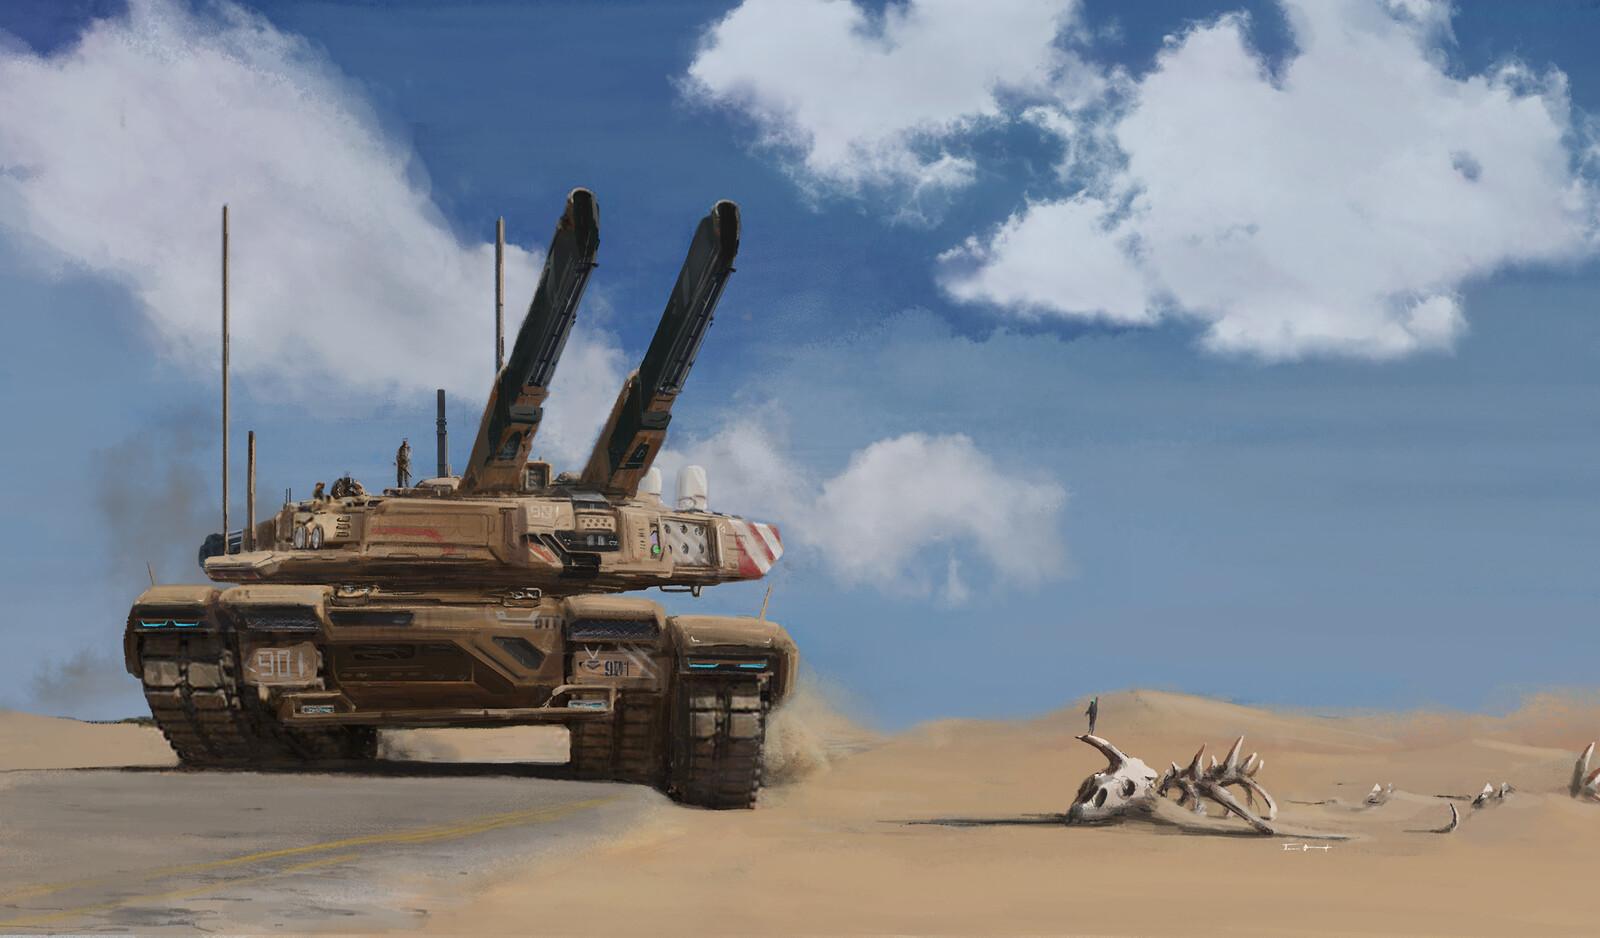 N.O.A Tank